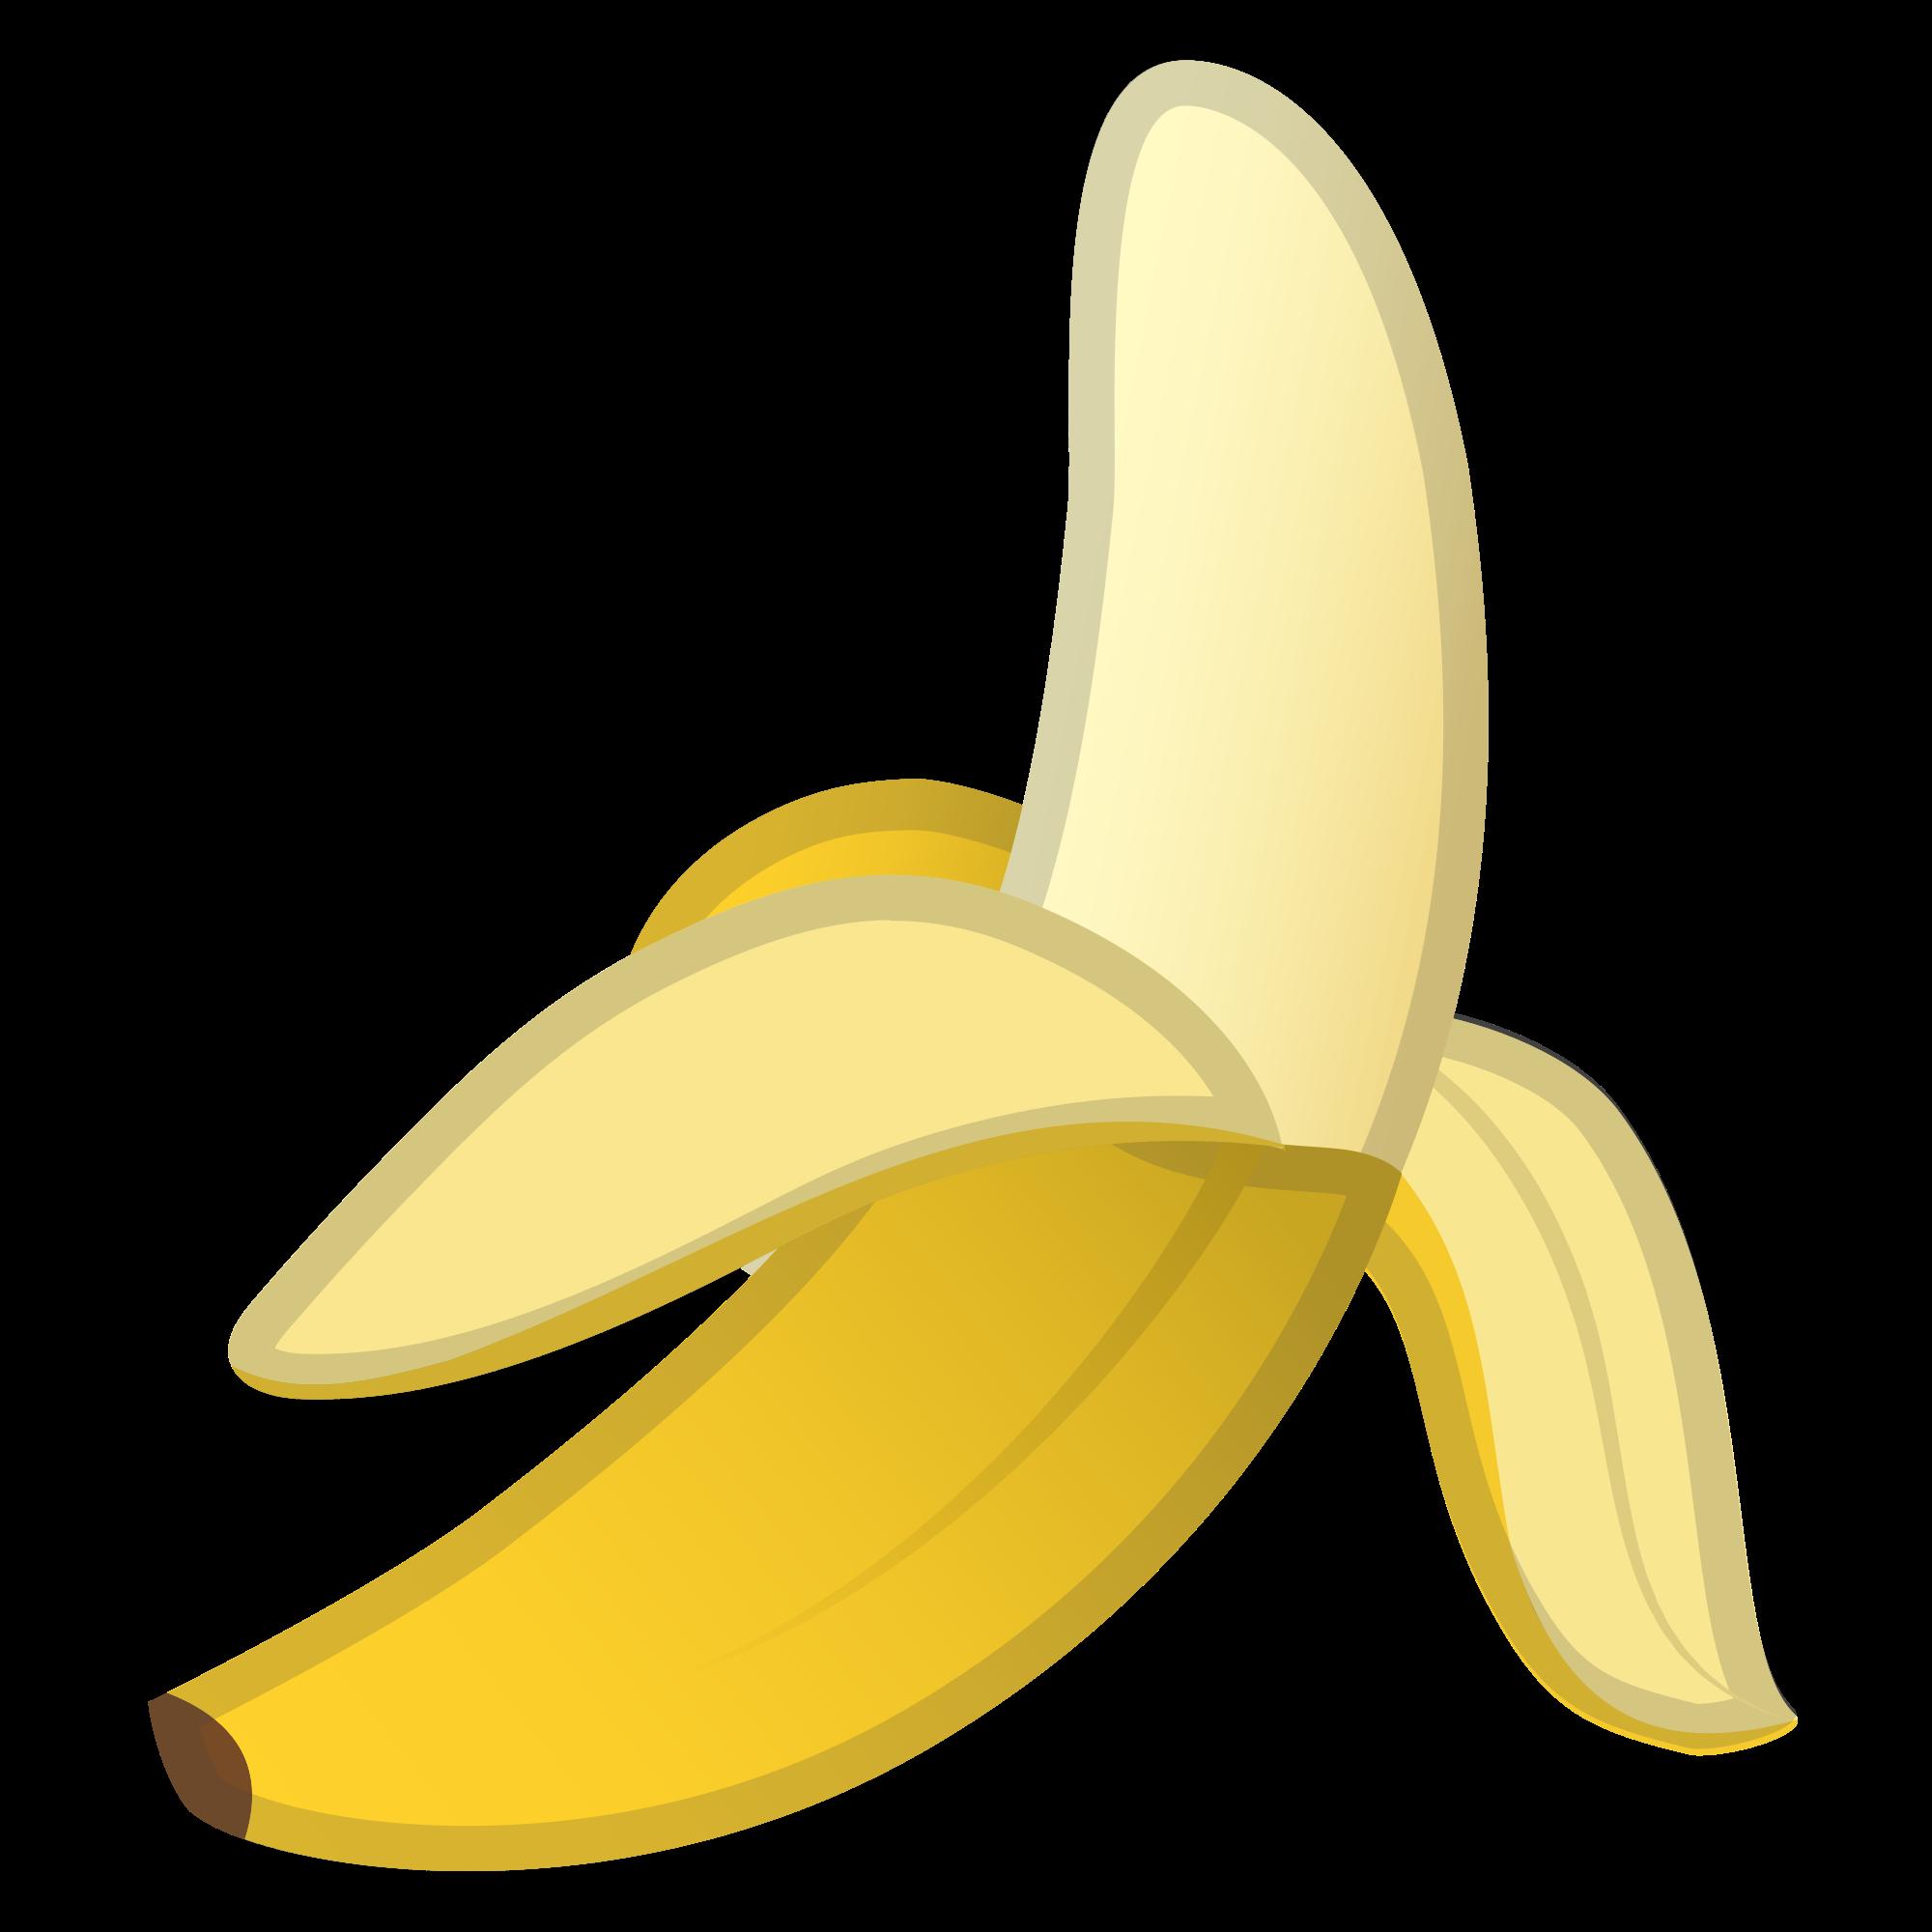 Emoji clipart banana. File noto oreo f